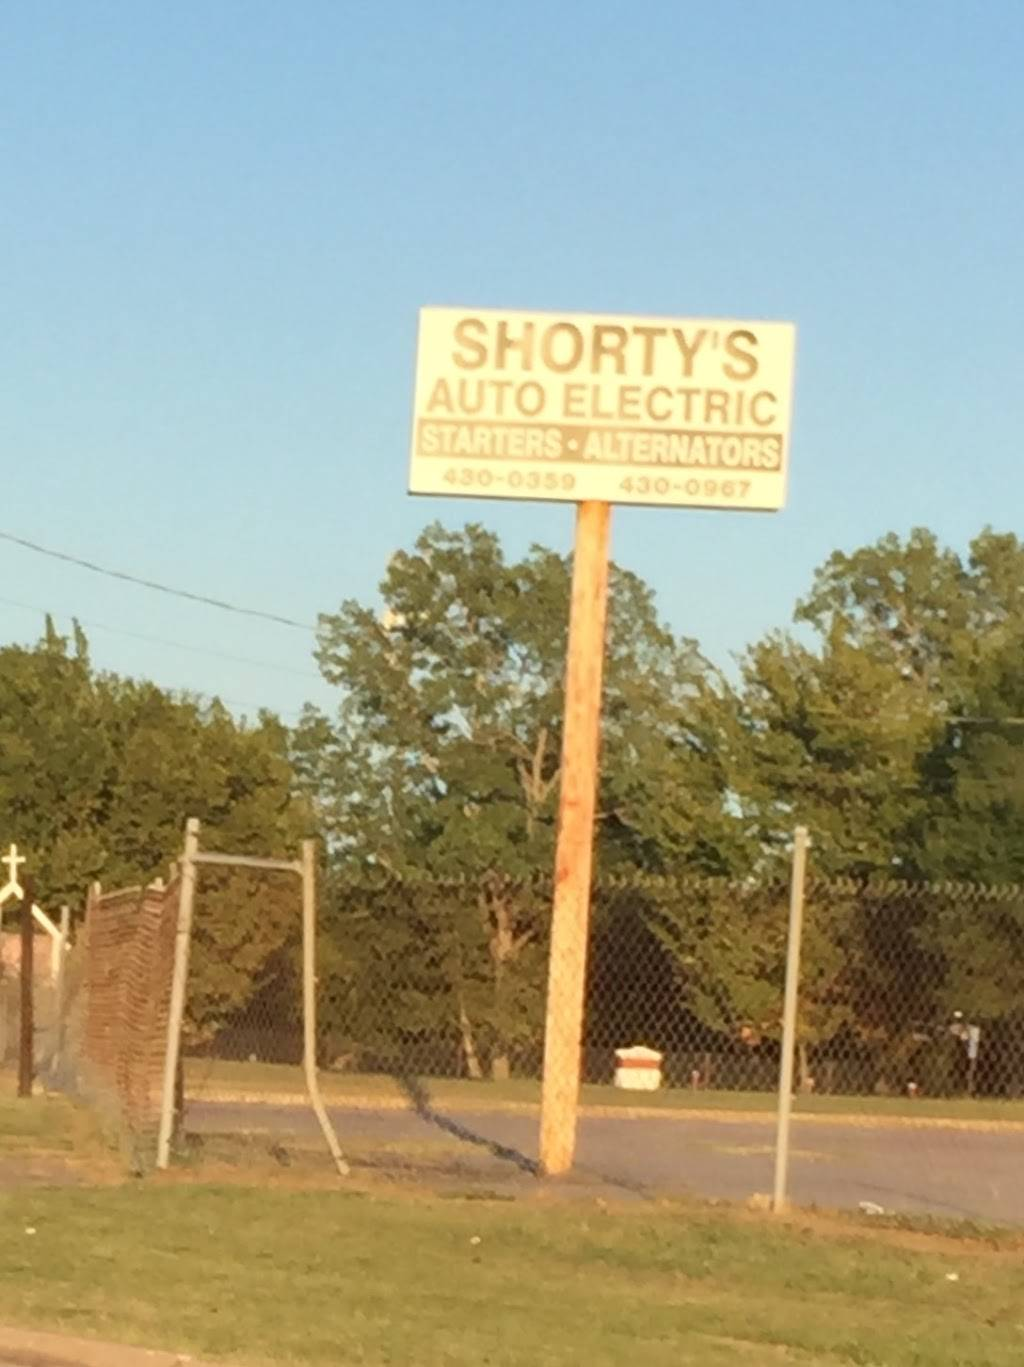 Shortys Auto Electric - car repair  | Photo 1 of 3 | Address: 2604 E Apache St, Tulsa, OK 74110, USA | Phone: (918) 430-0359